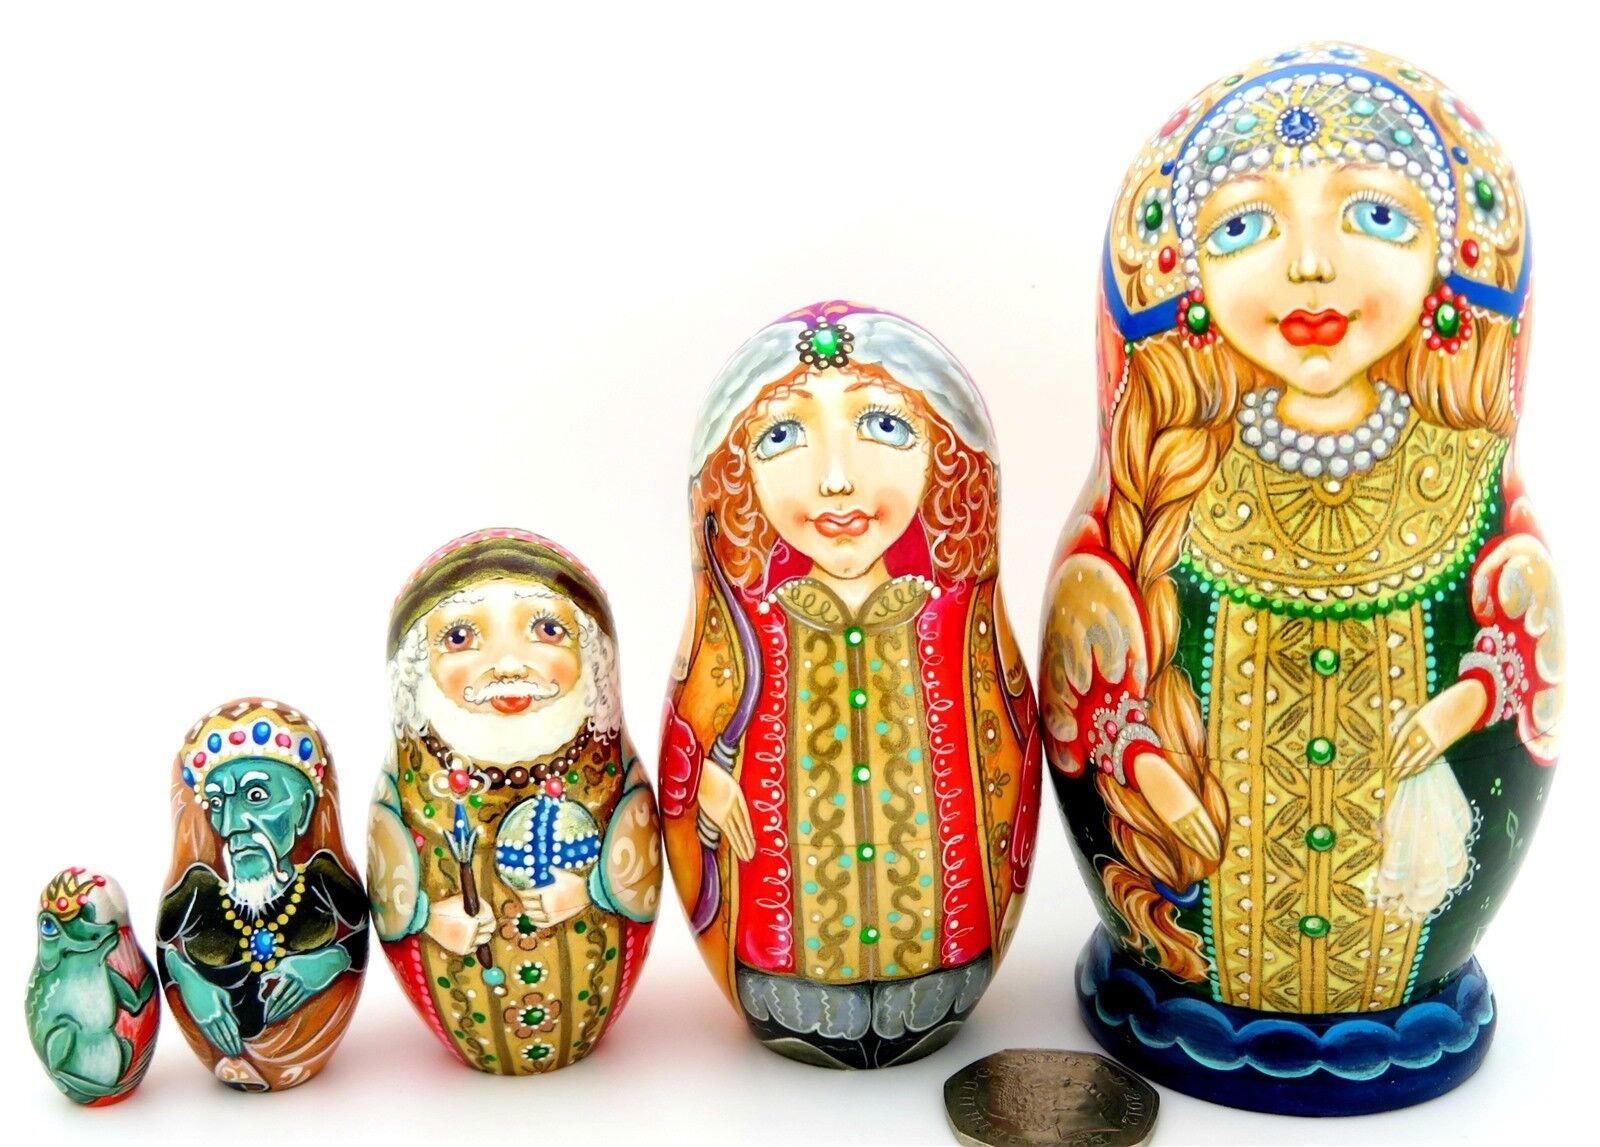 Fairy Tale Frog Princess Russian hand painted 5 nesting dolls signed Pokrovskaya